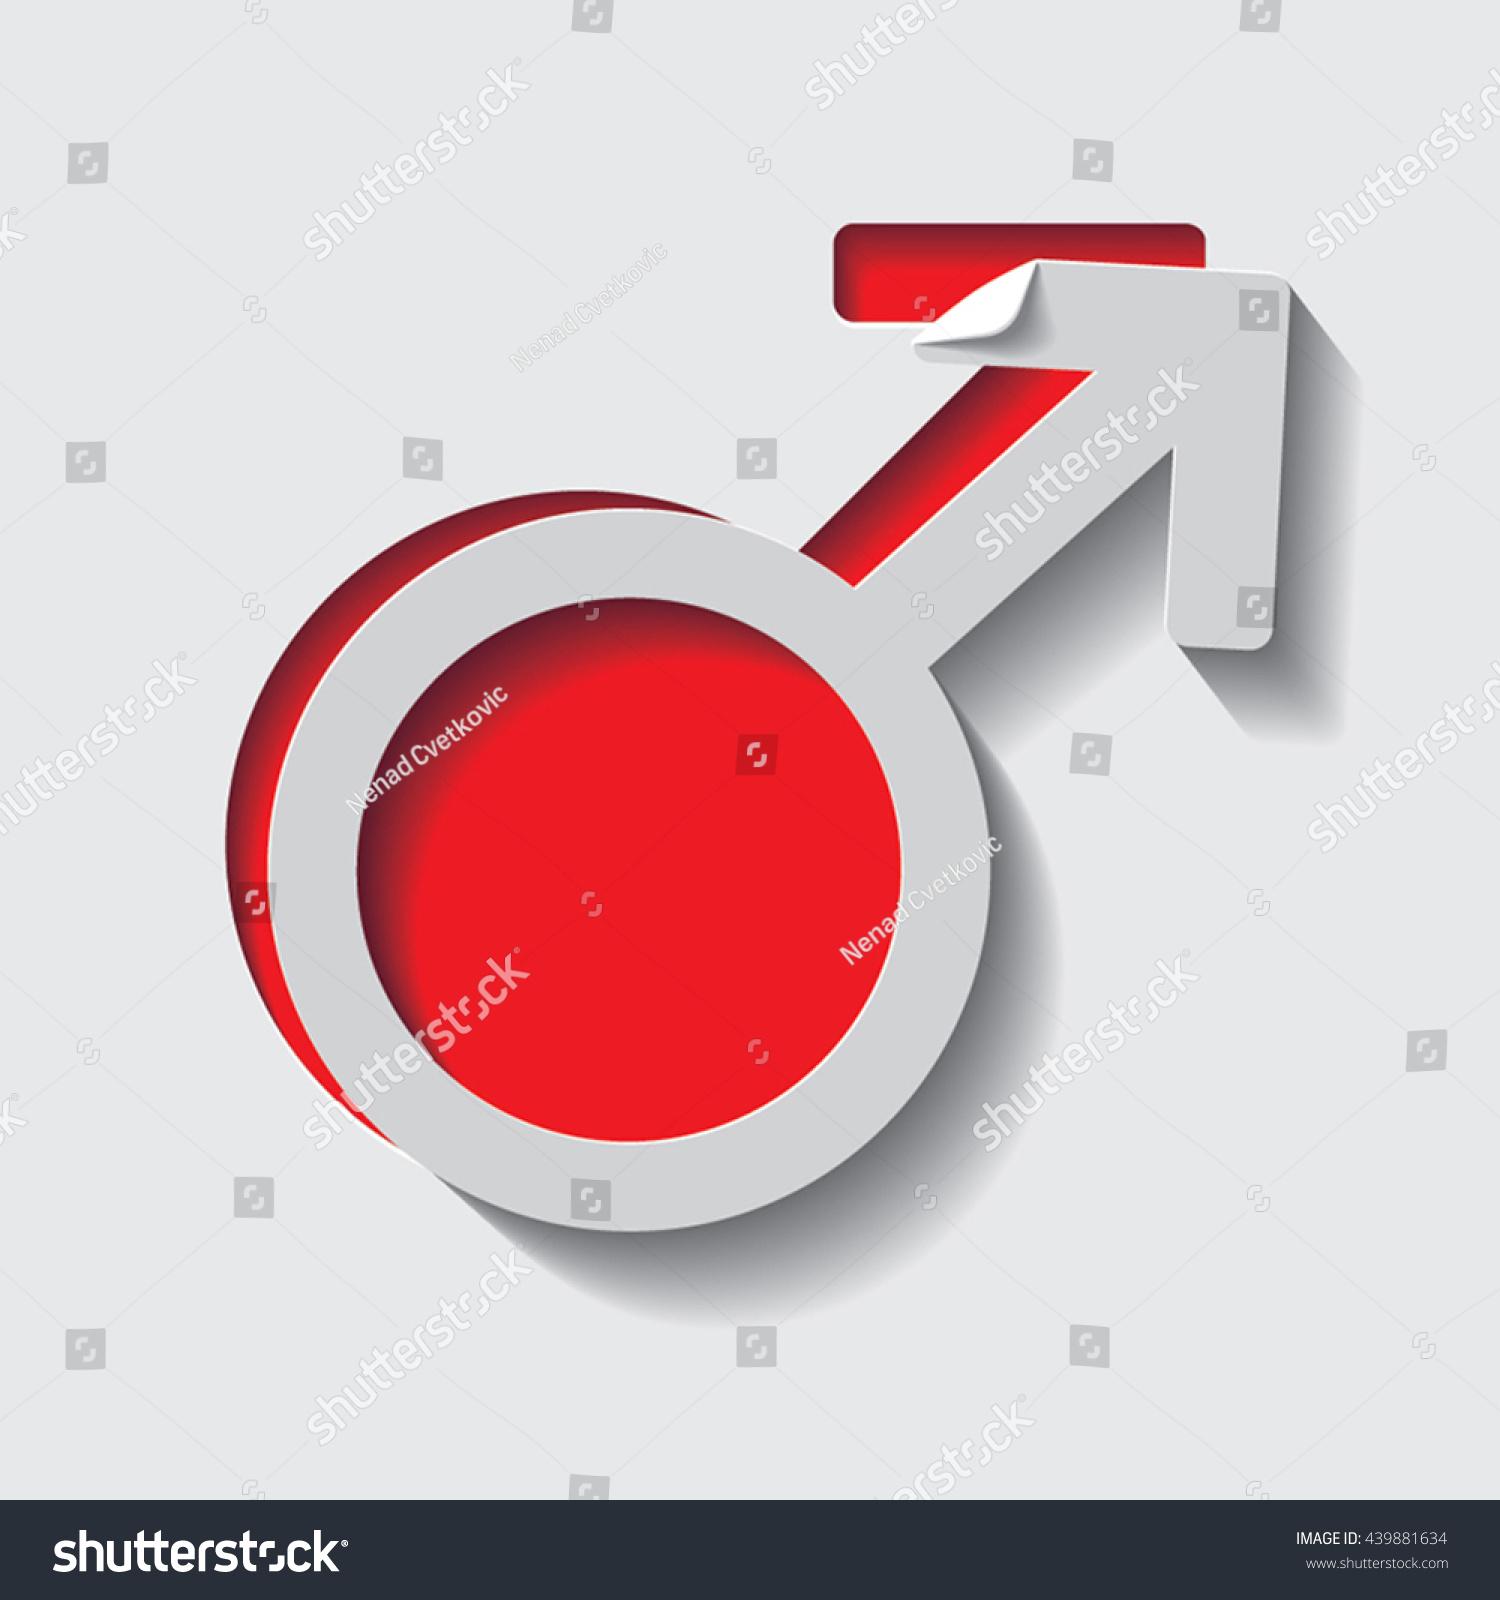 Planet mars cutout stylized symbol curl stock vector 439881634 planet mars cutout stylized symbol with curl elementctor illustration biocorpaavc Choice Image